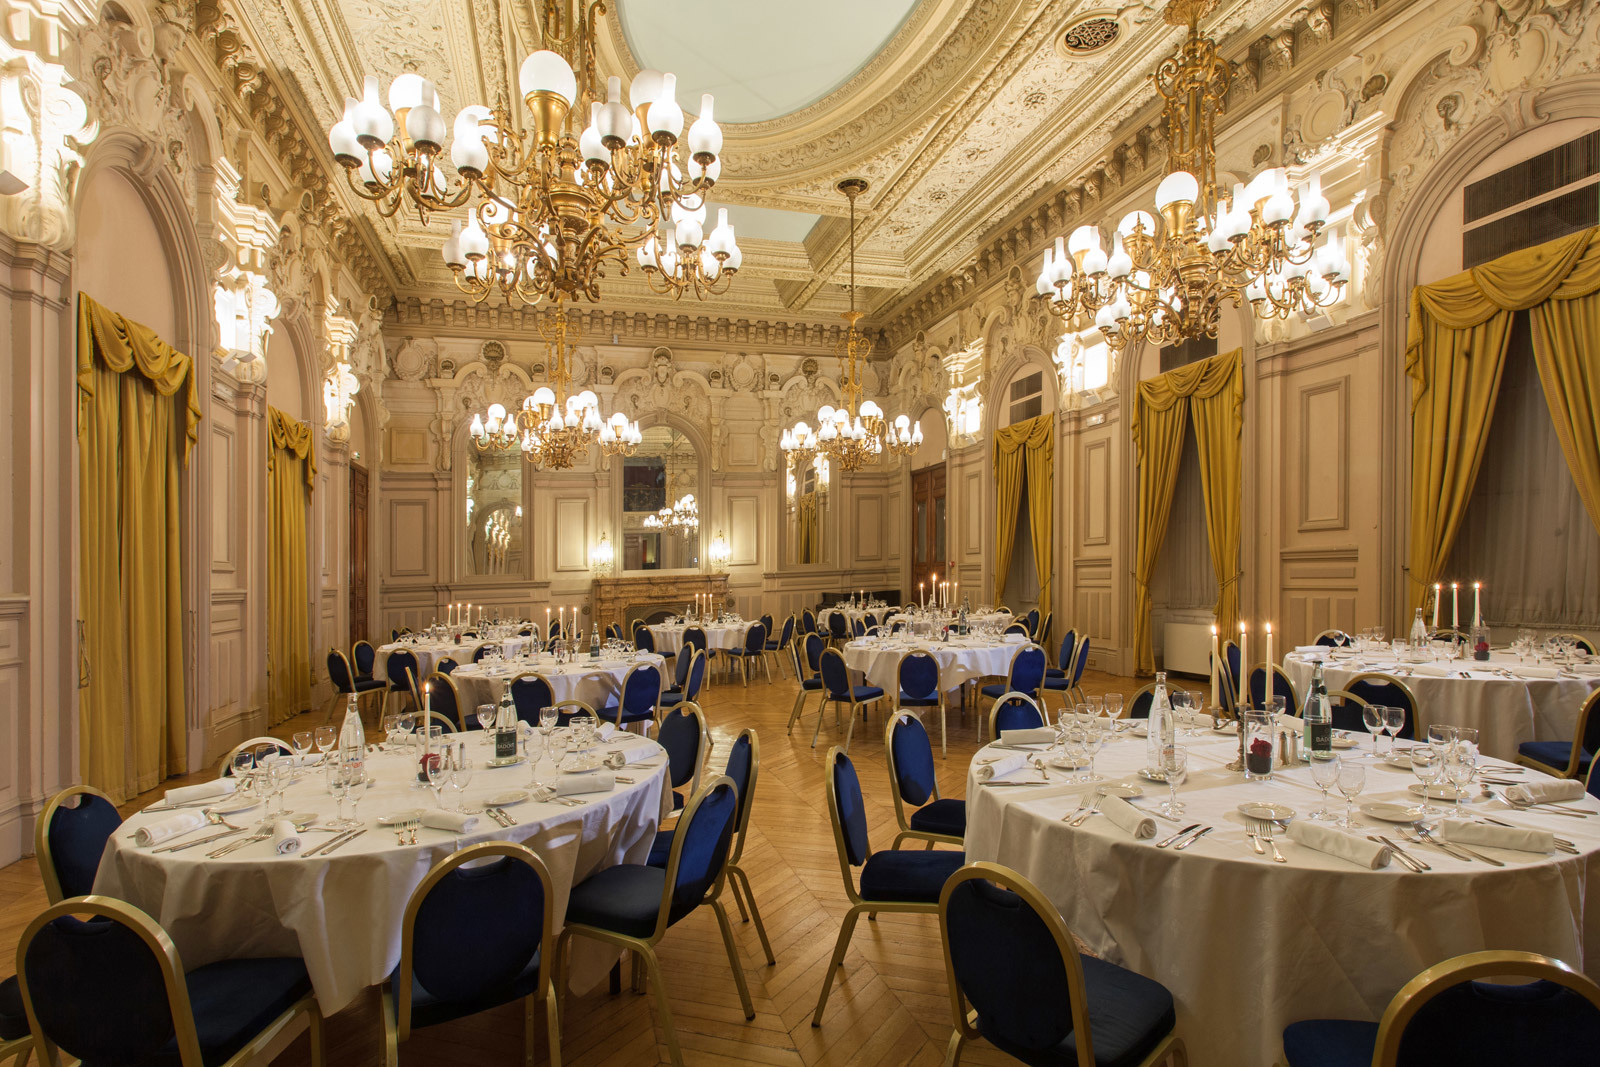 Westminster Nice Hotel & Spa